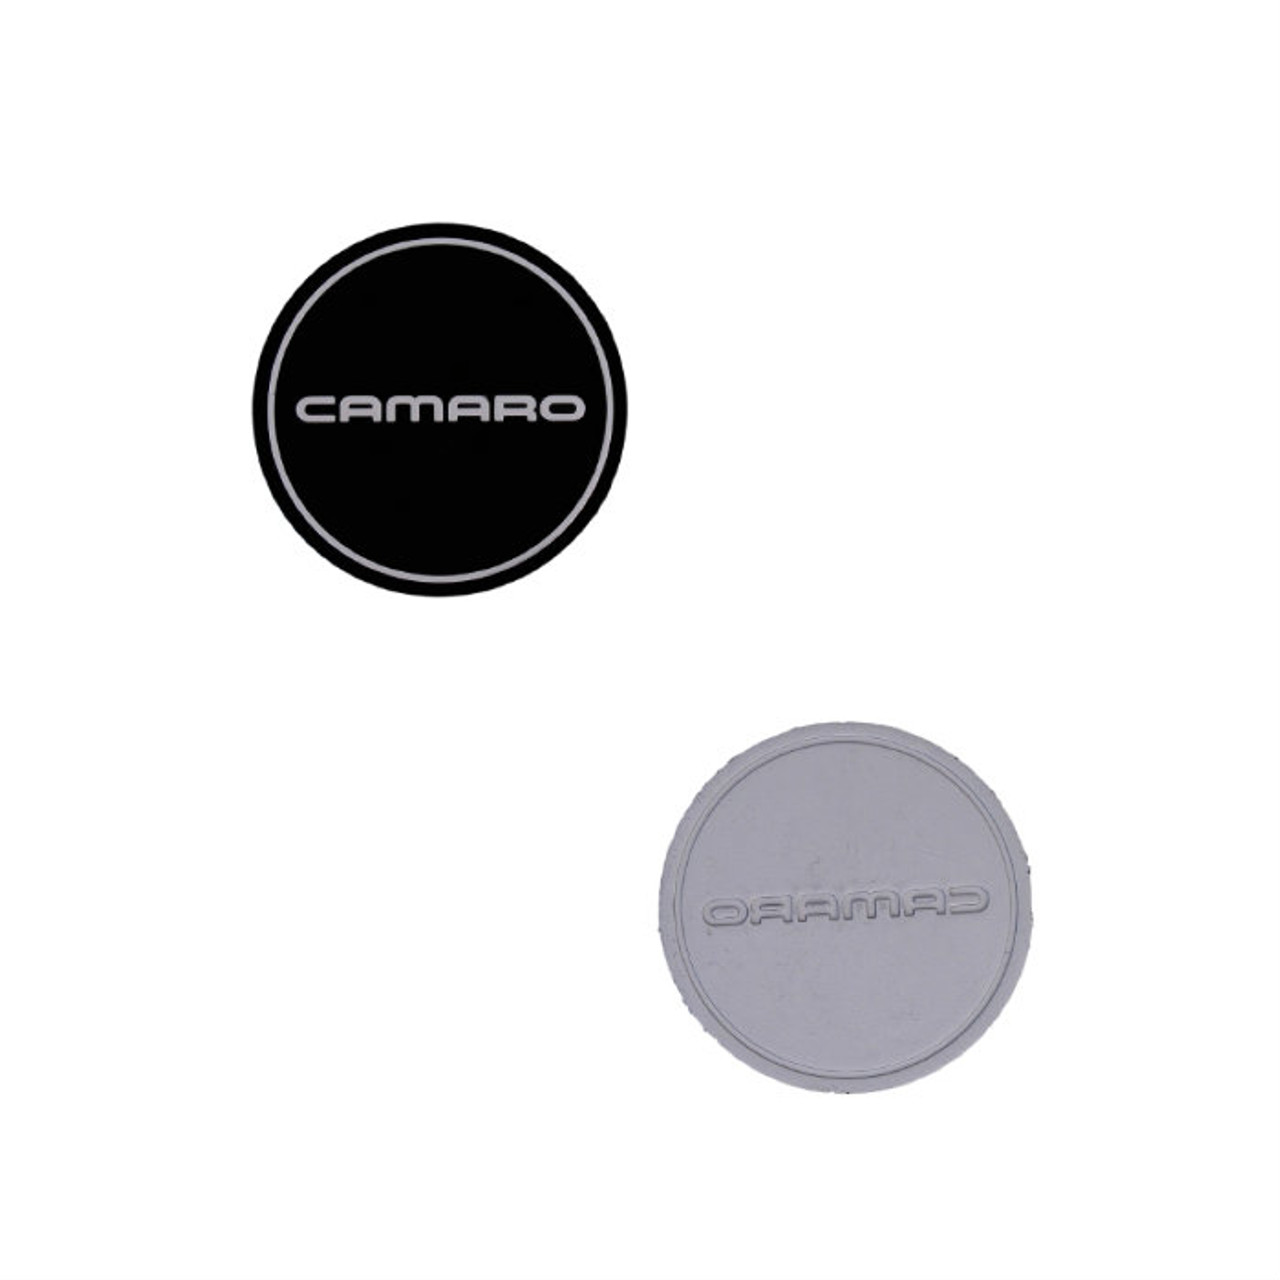 1986-1989 Chevy Camaro Wheel Center Cap Emblem NOS